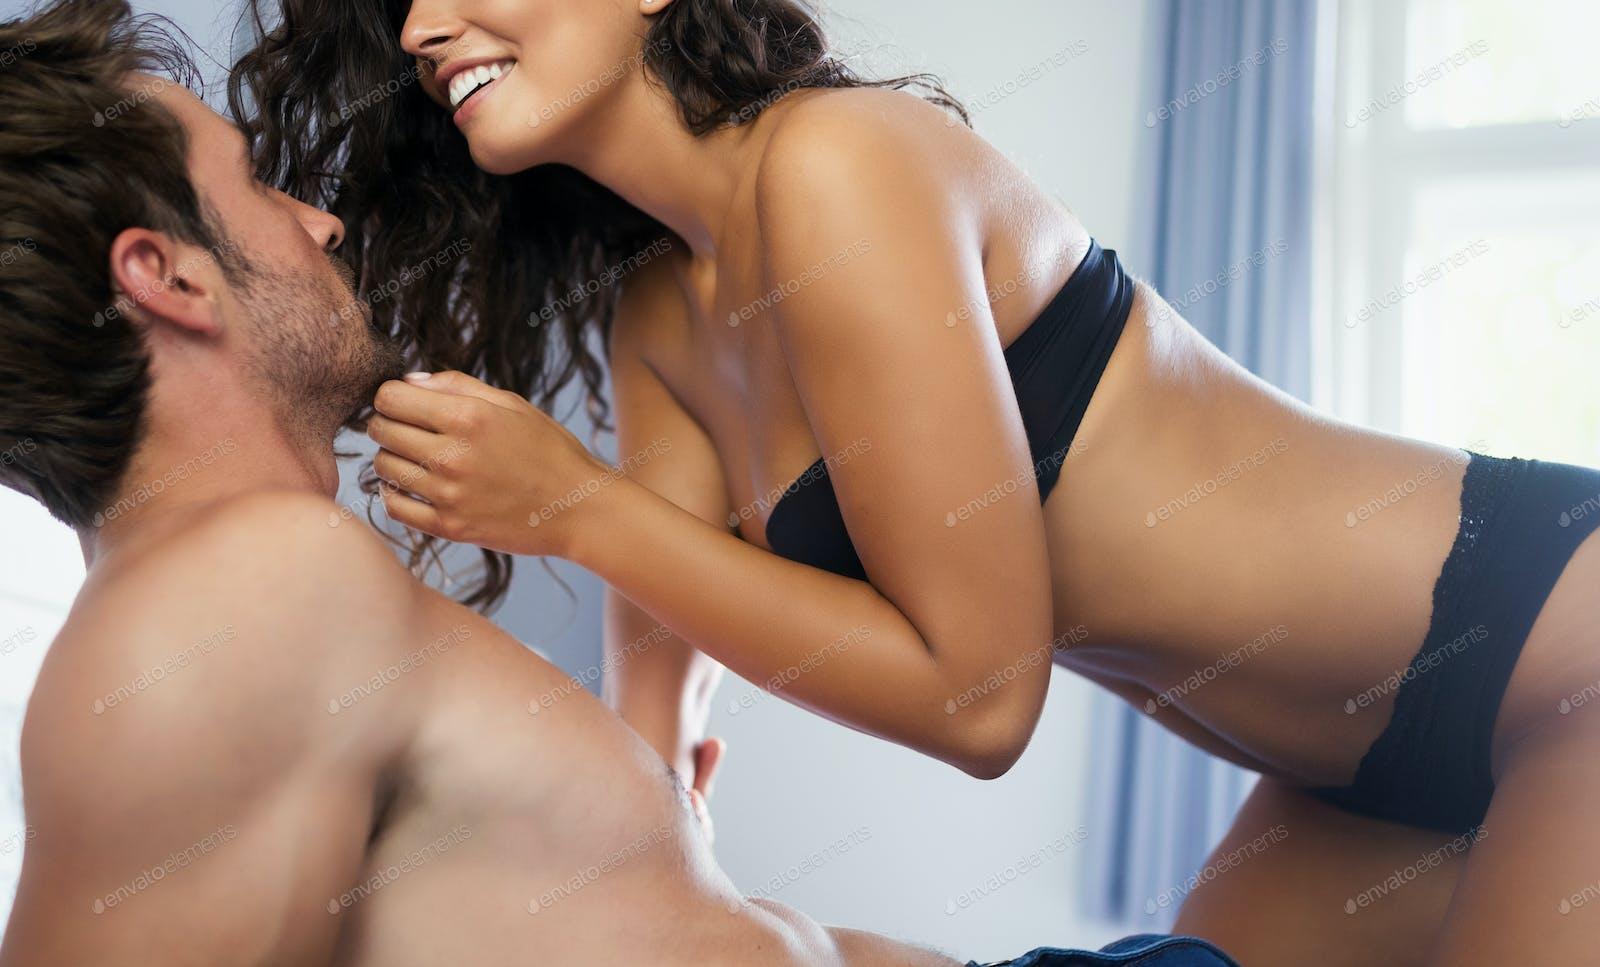 Kissing hot women A Very